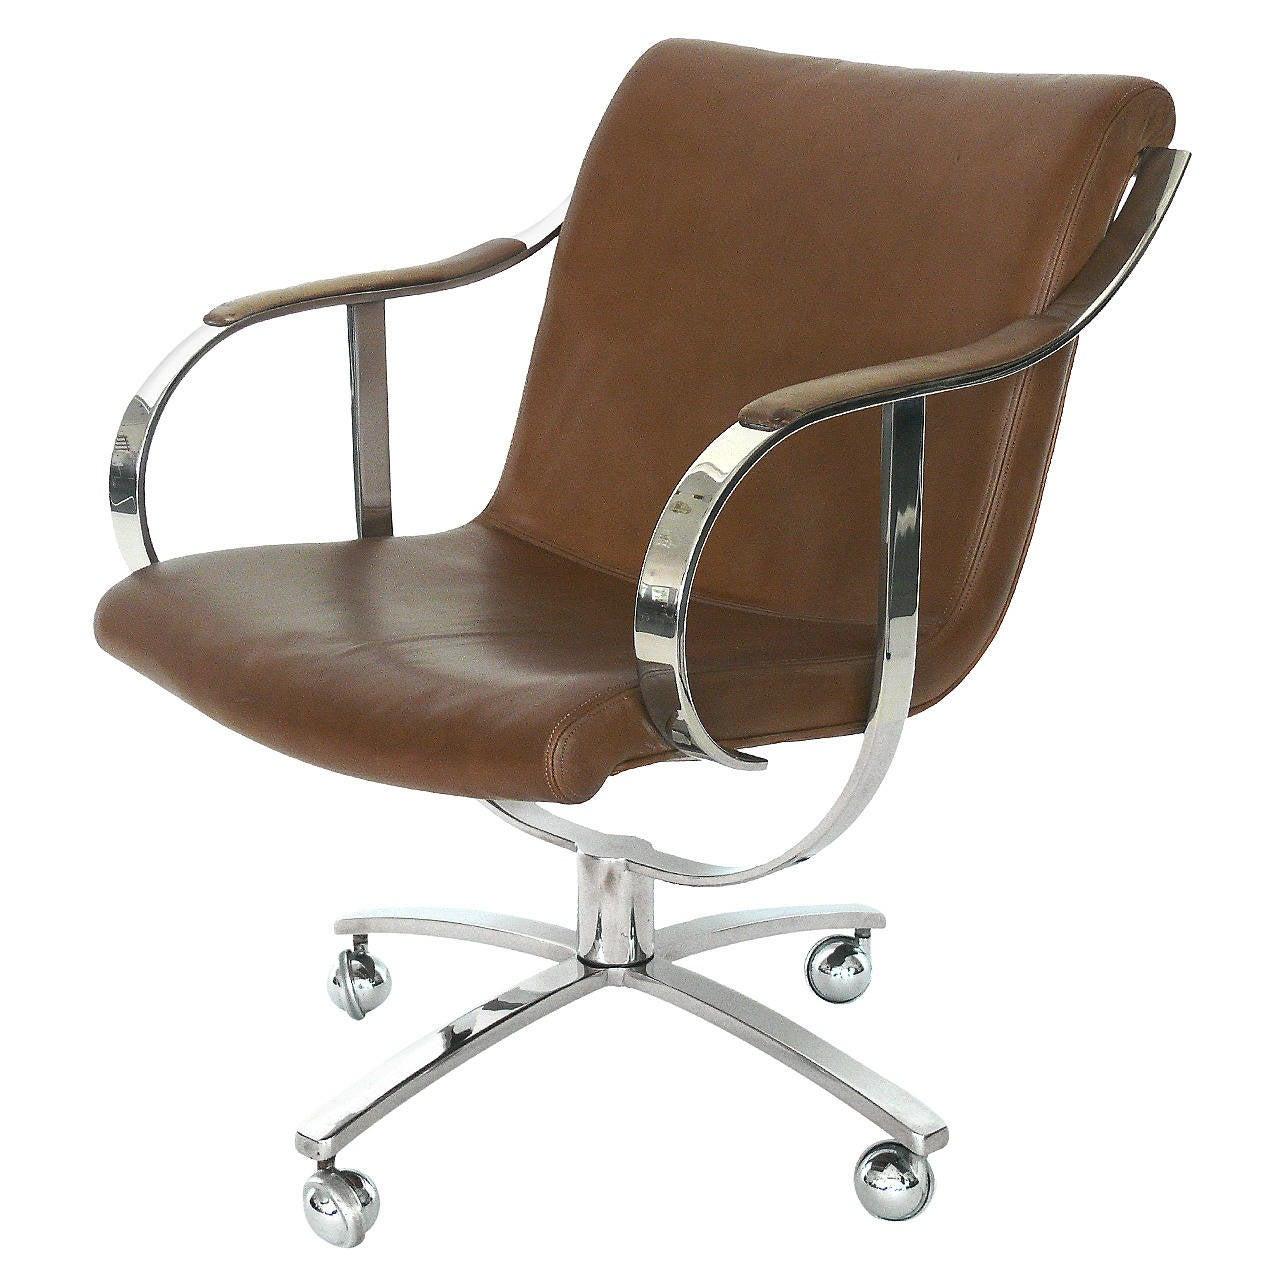 Steelcase Chair by Gardner Leaver